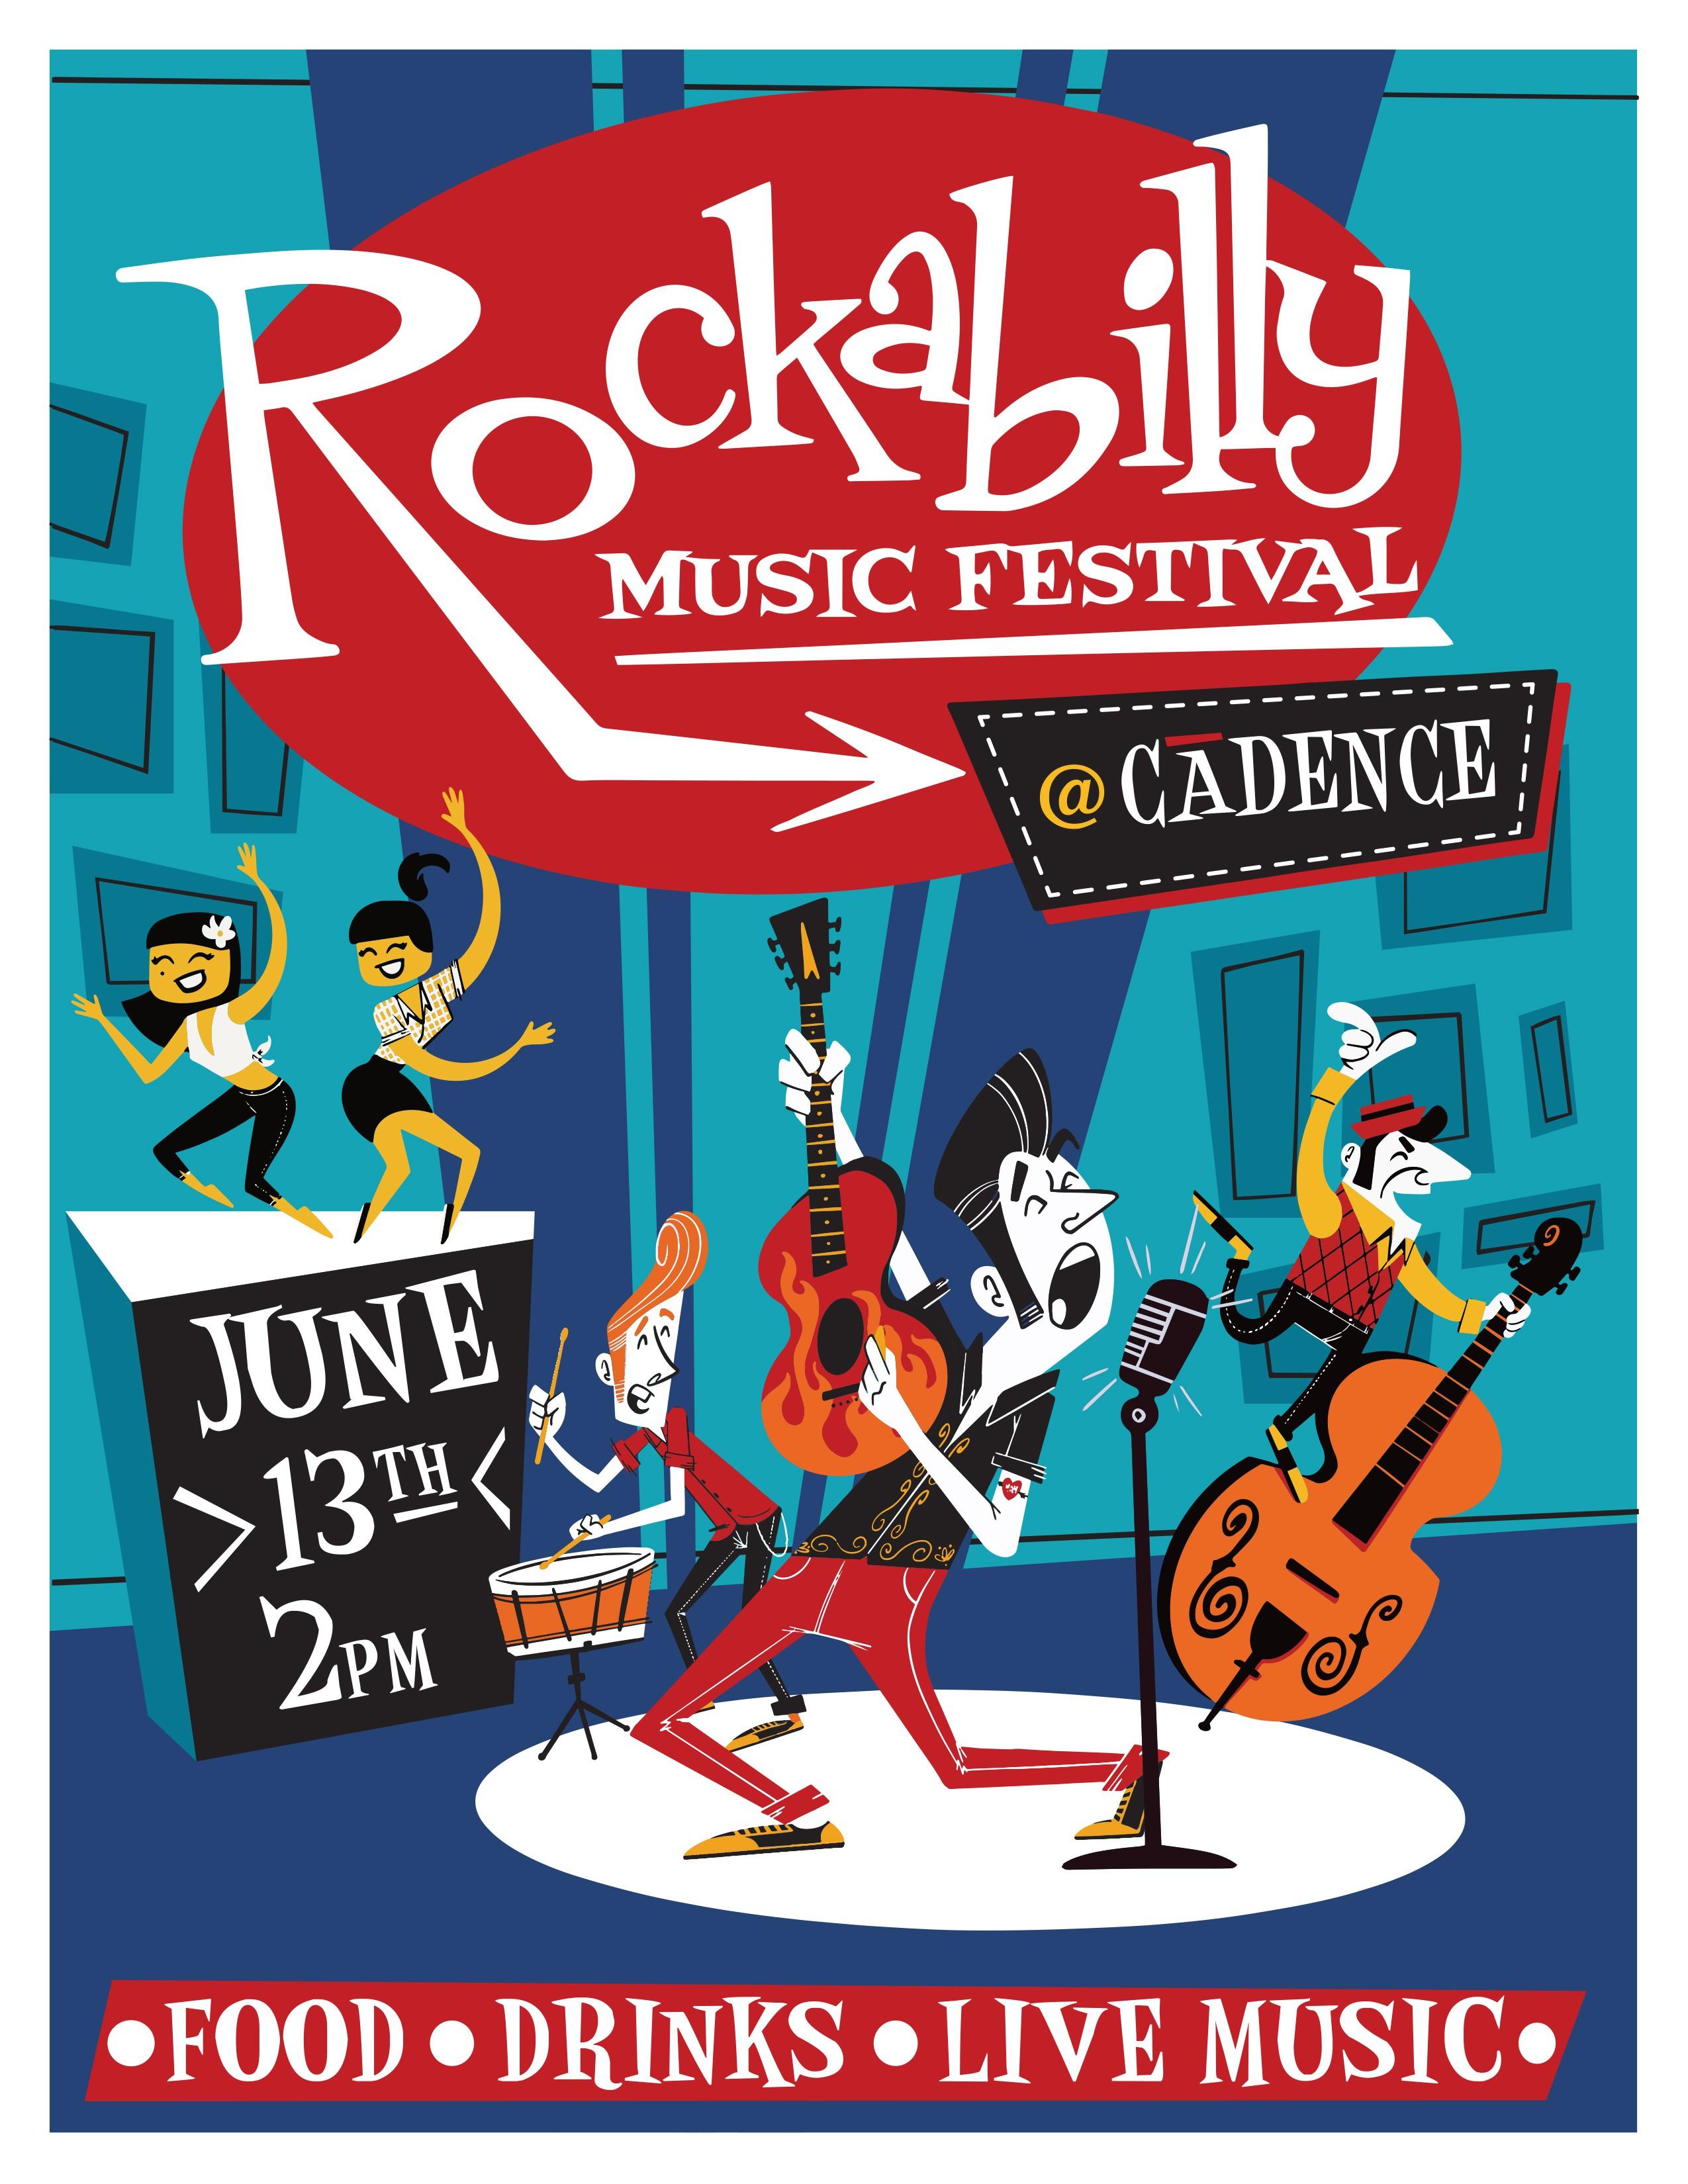 RockaBilly Music Festival